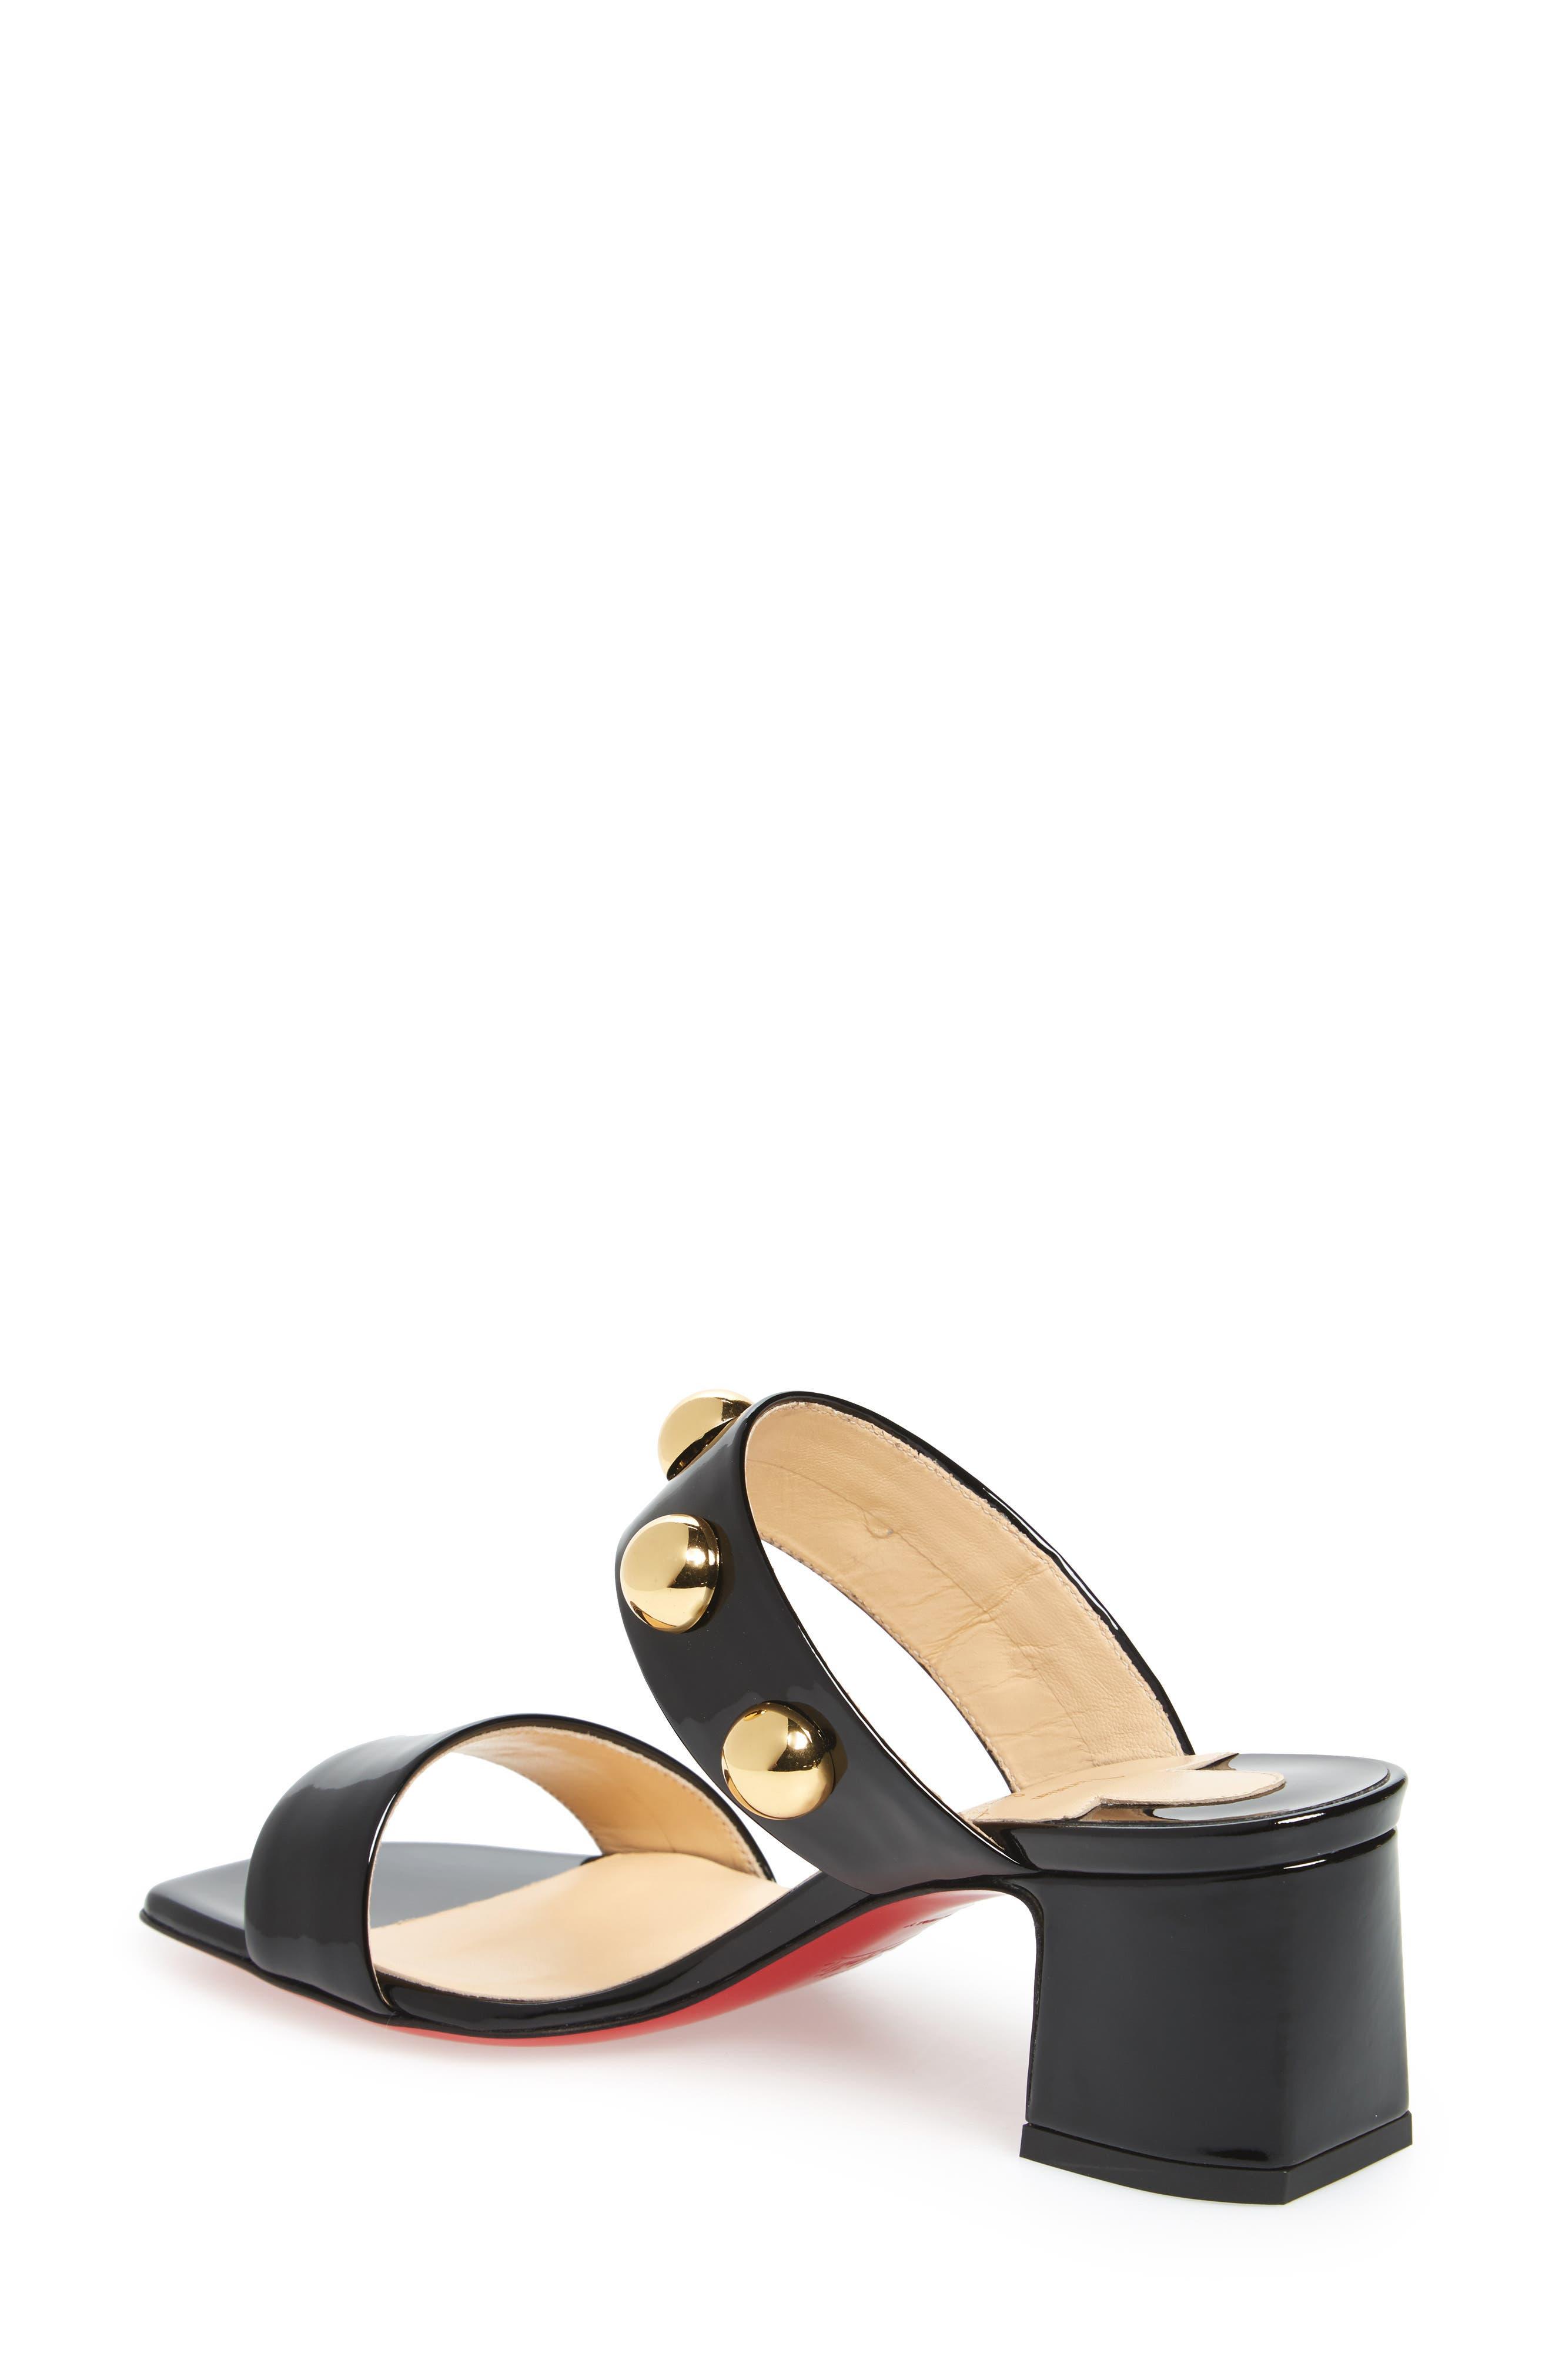 Simple Bille Ornament Slide Sandal,                             Alternate thumbnail 2, color,                             Black/ Gold